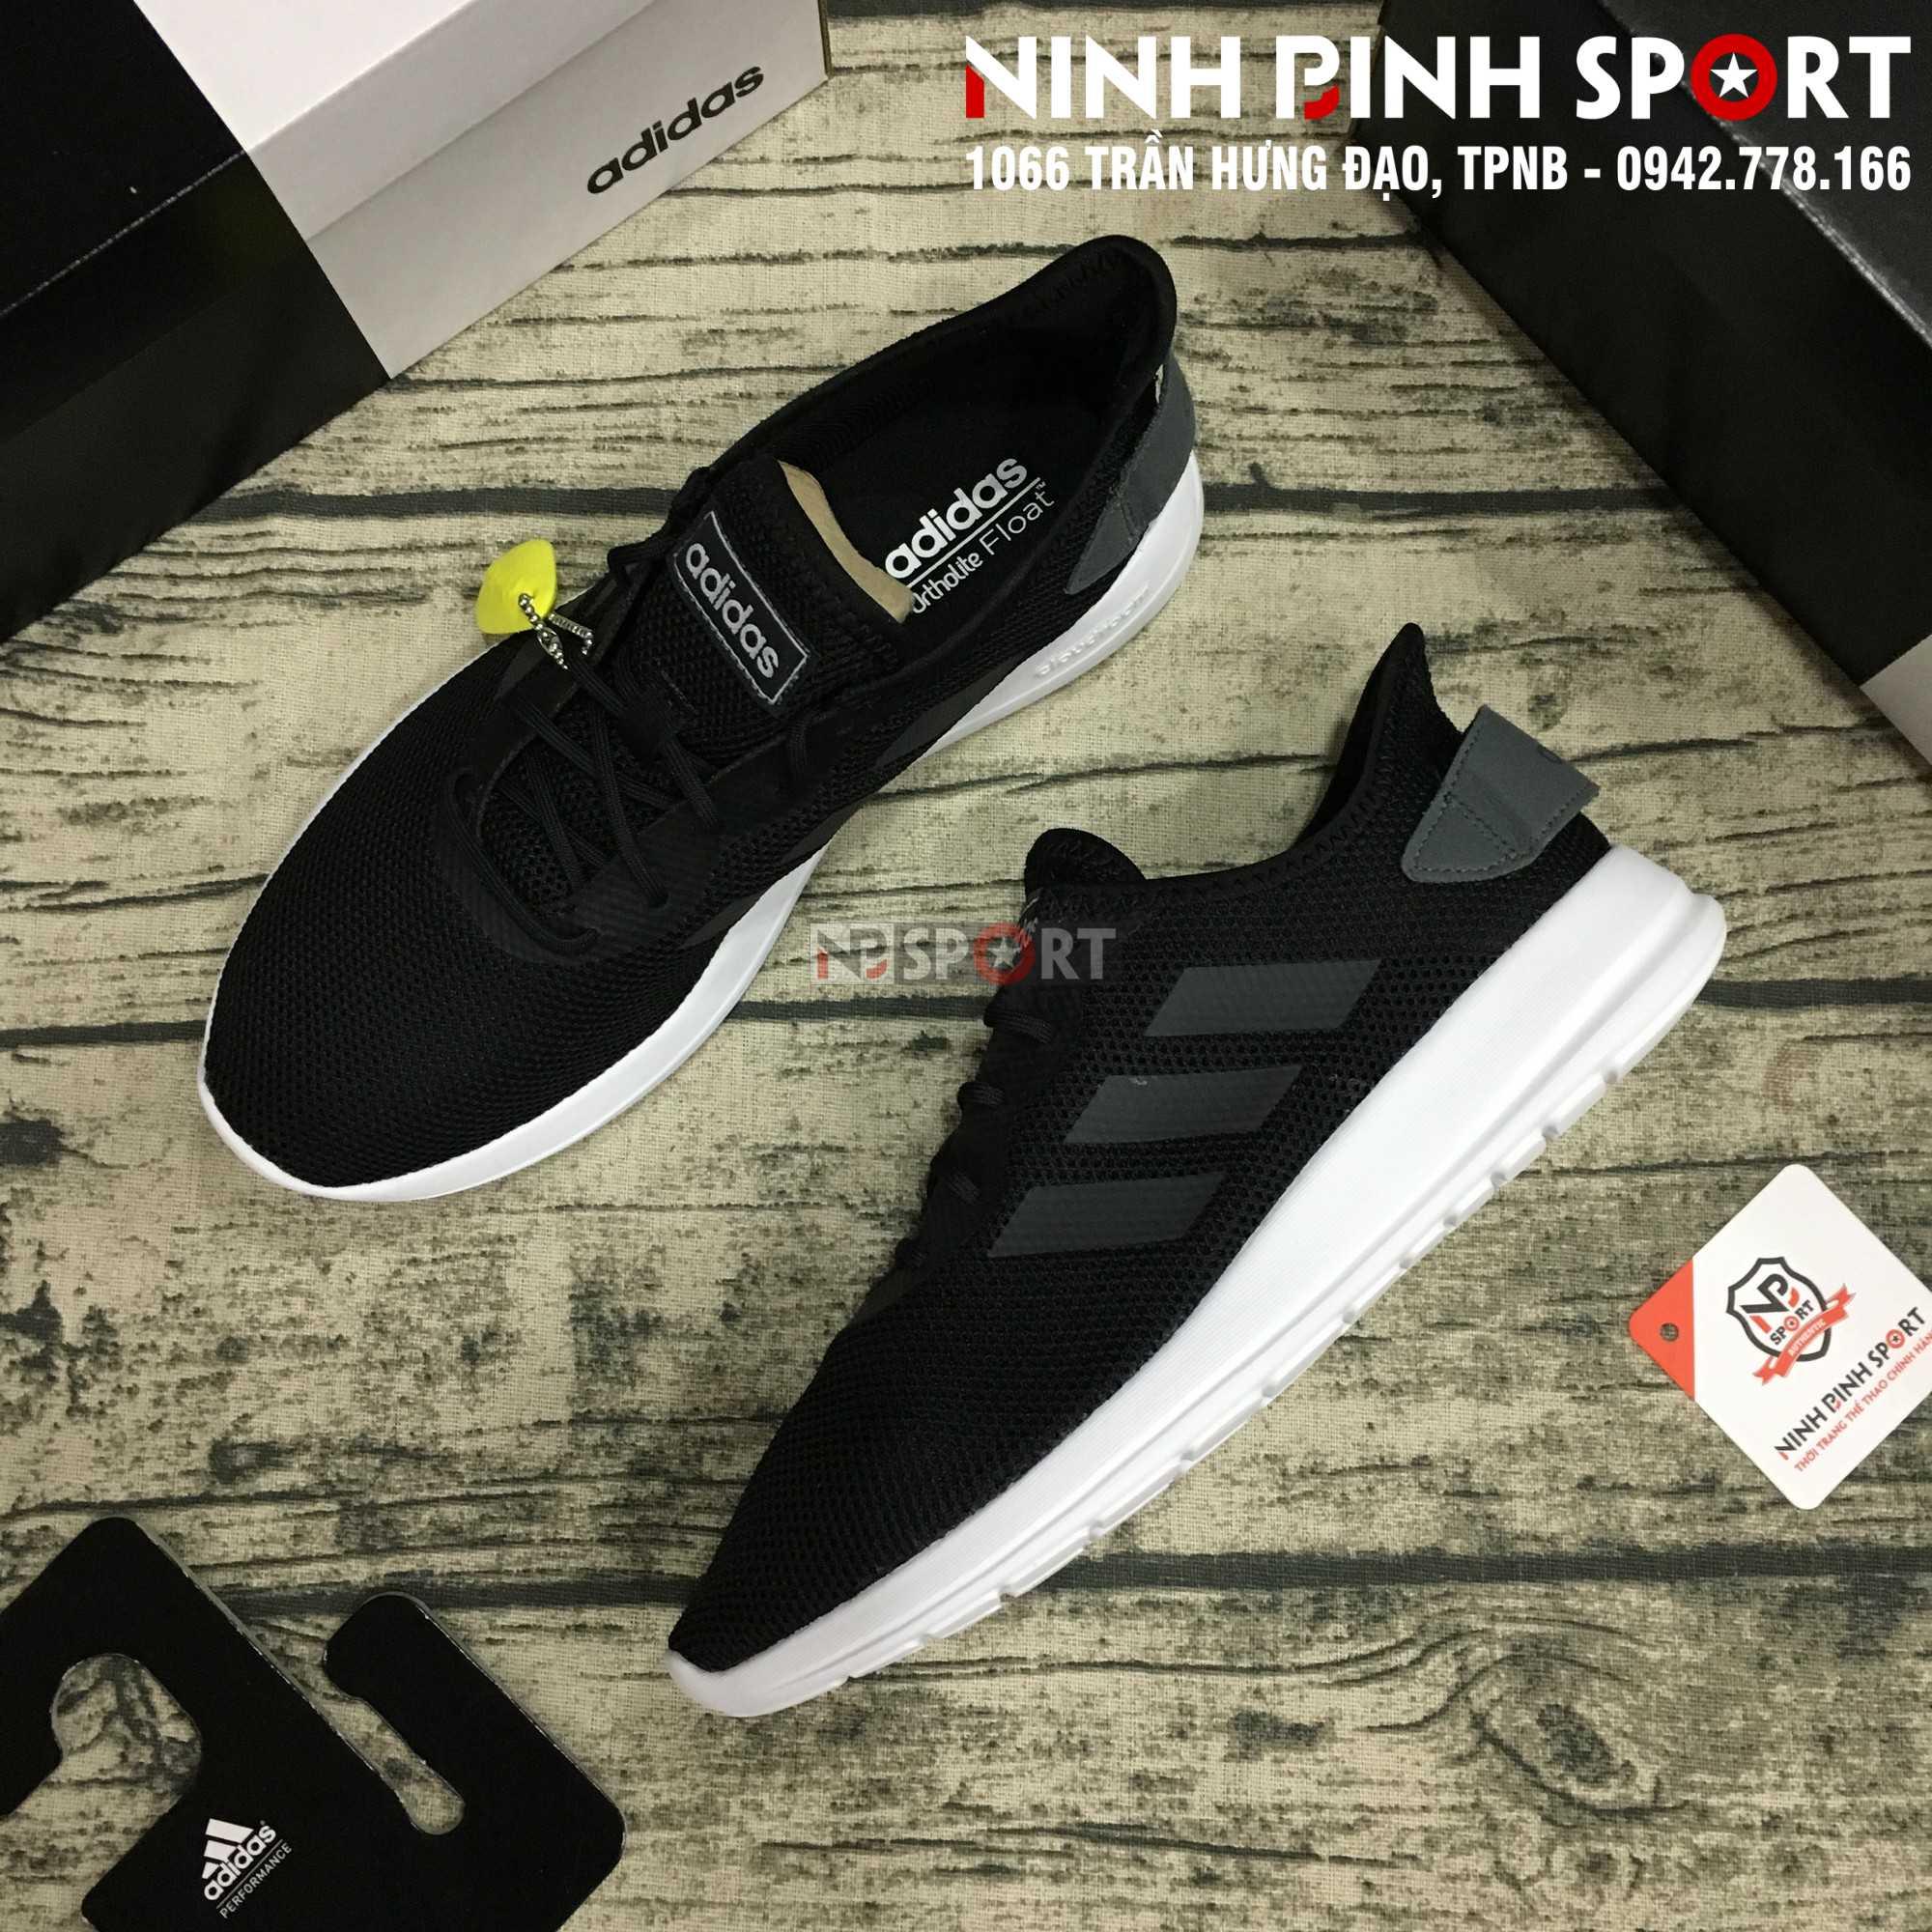 Giầy thể thao nữ Adidas Yatra F36517